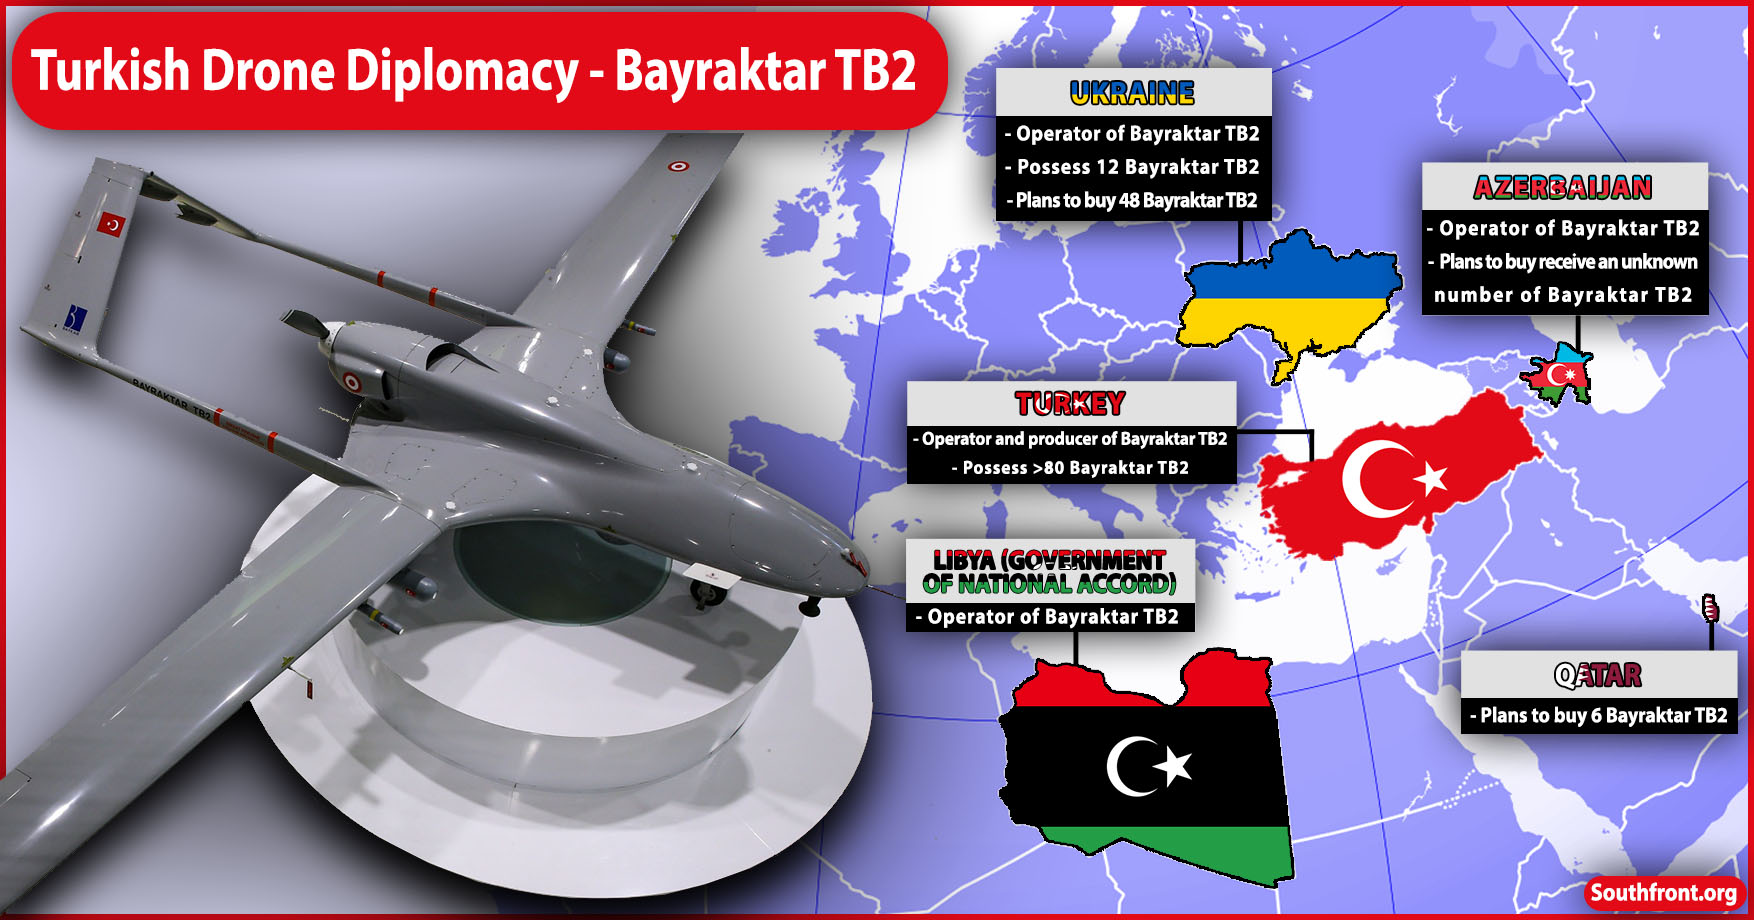 Turkish Drone Diplomacy